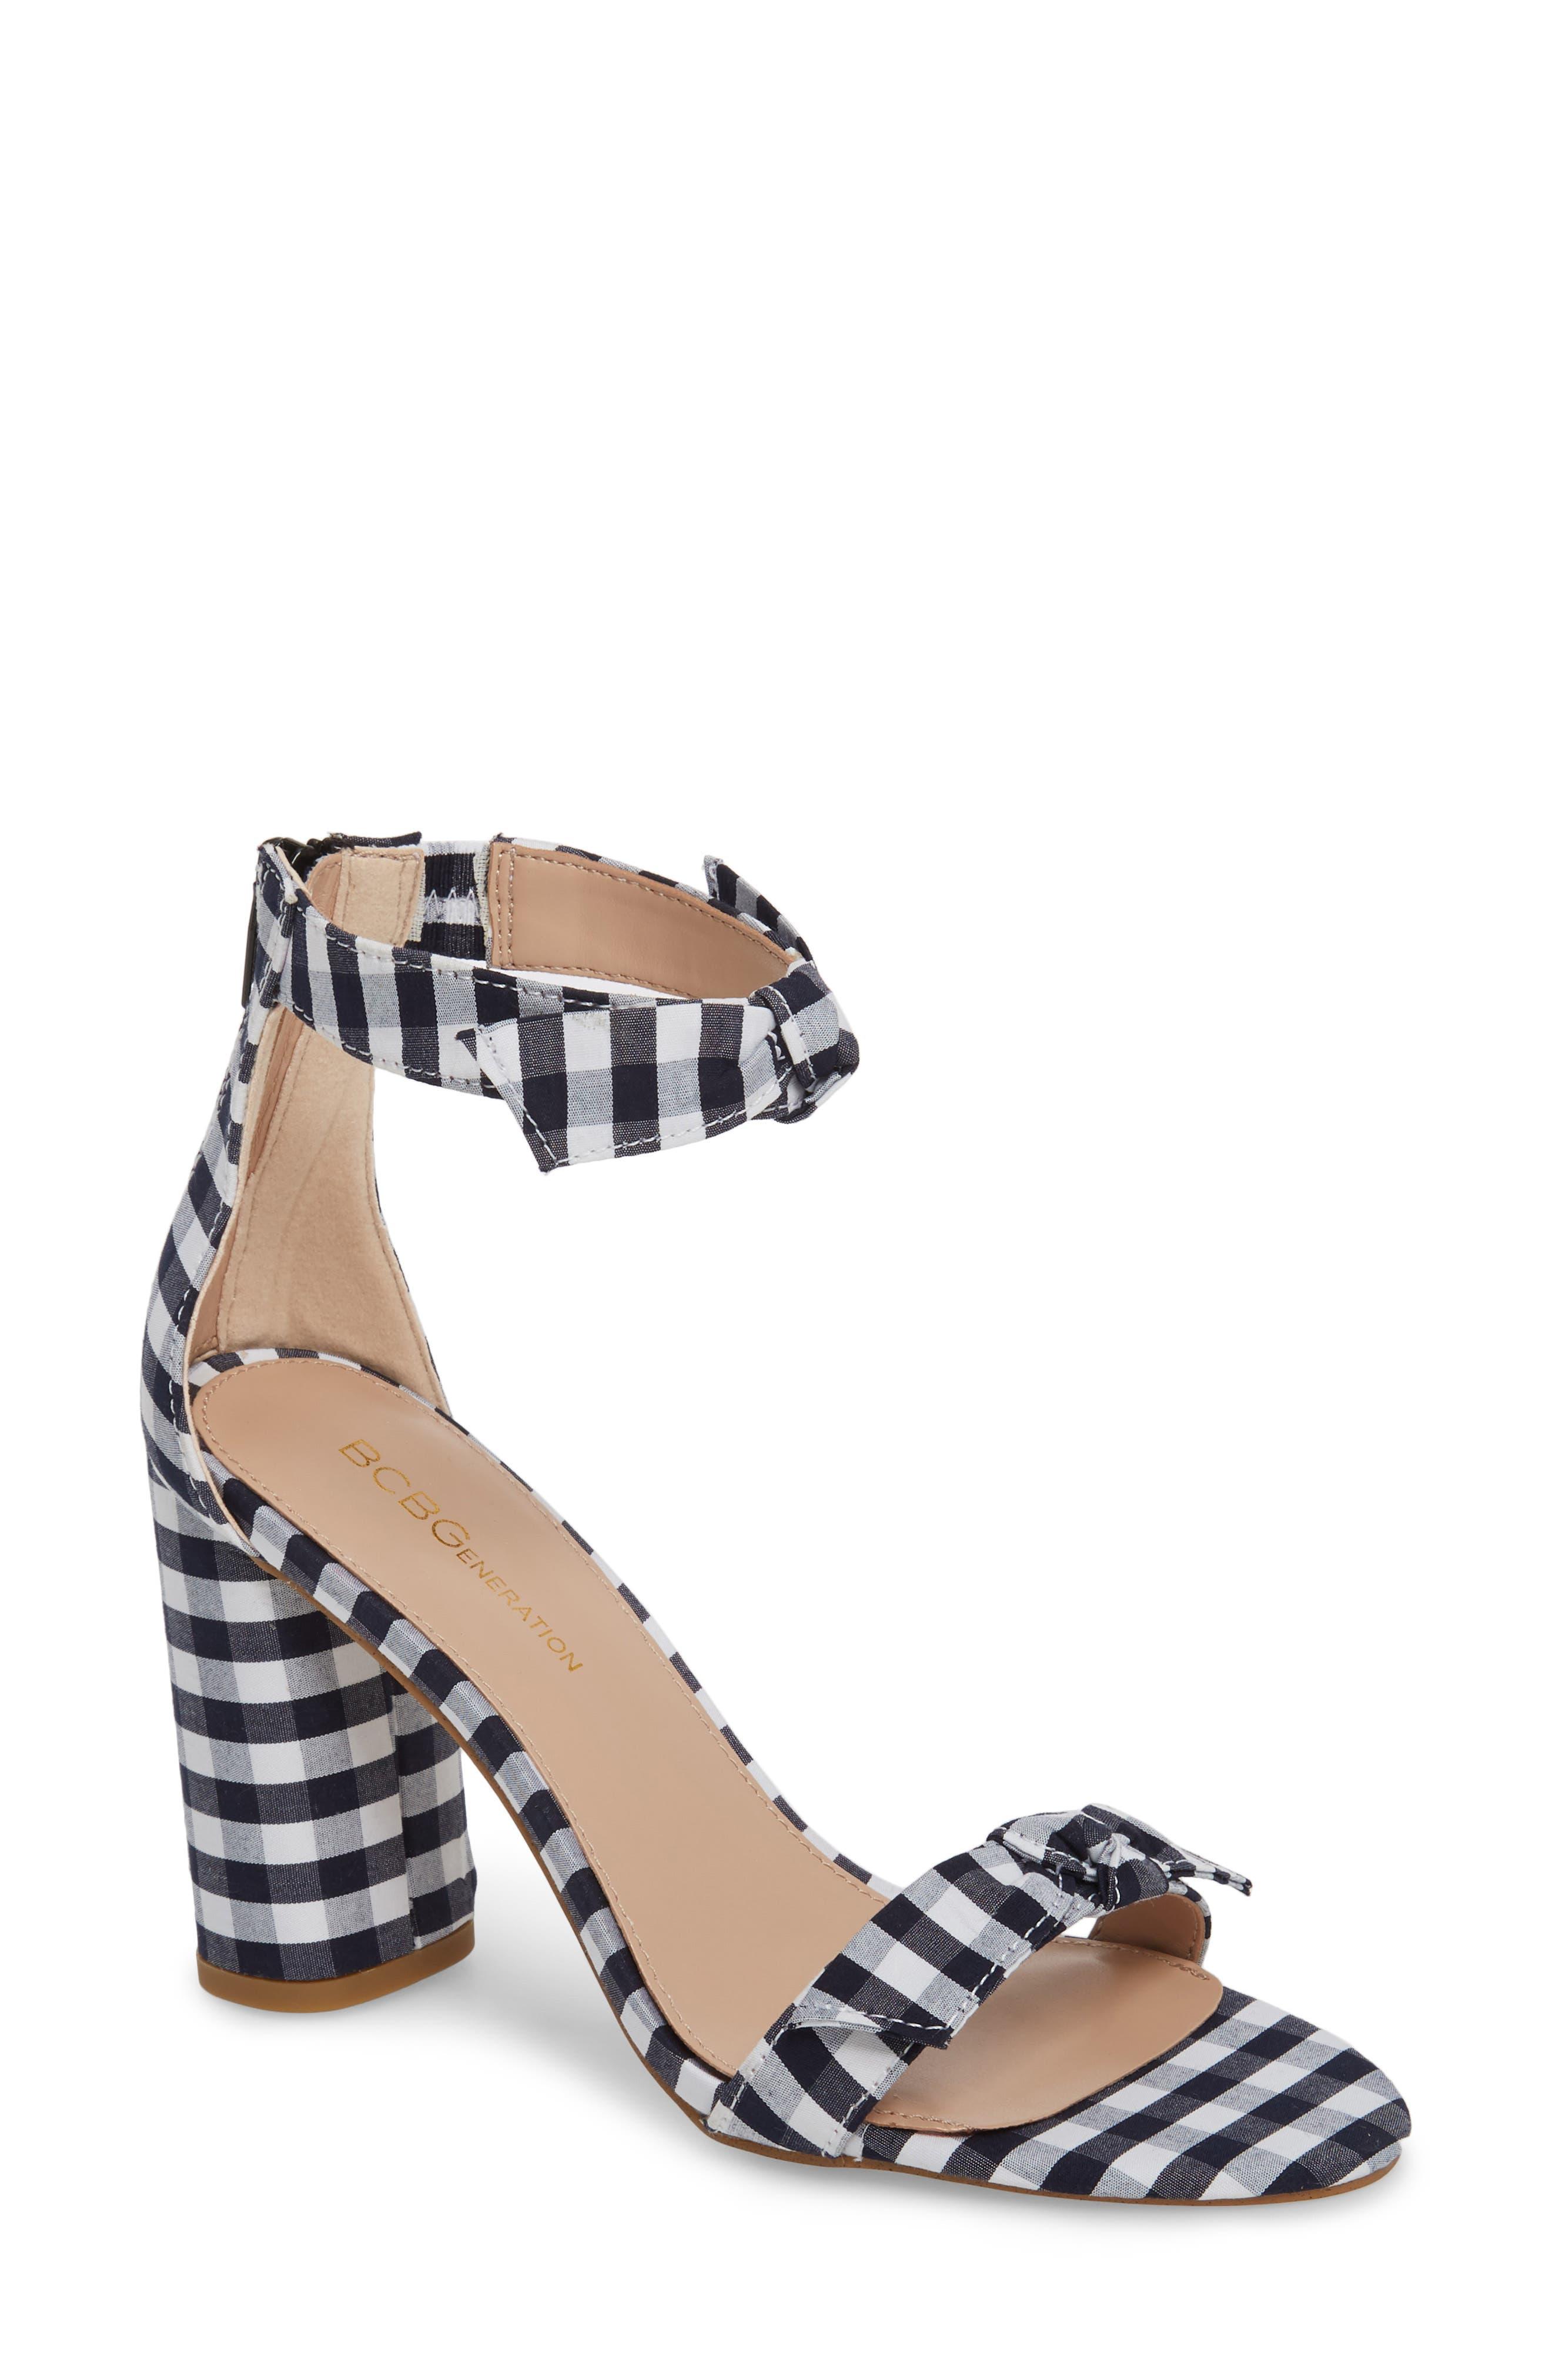 Faedra Ankle Strap Sandal,                             Main thumbnail 1, color,                             Dark Blue/ White